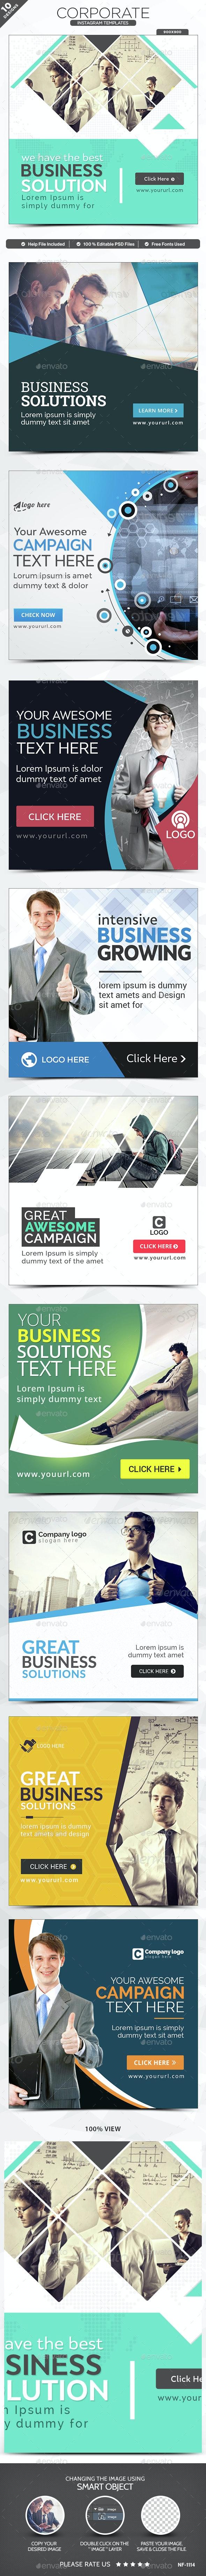 Corporate Instagram Banners - 10 Designs - Social Media Web Elements